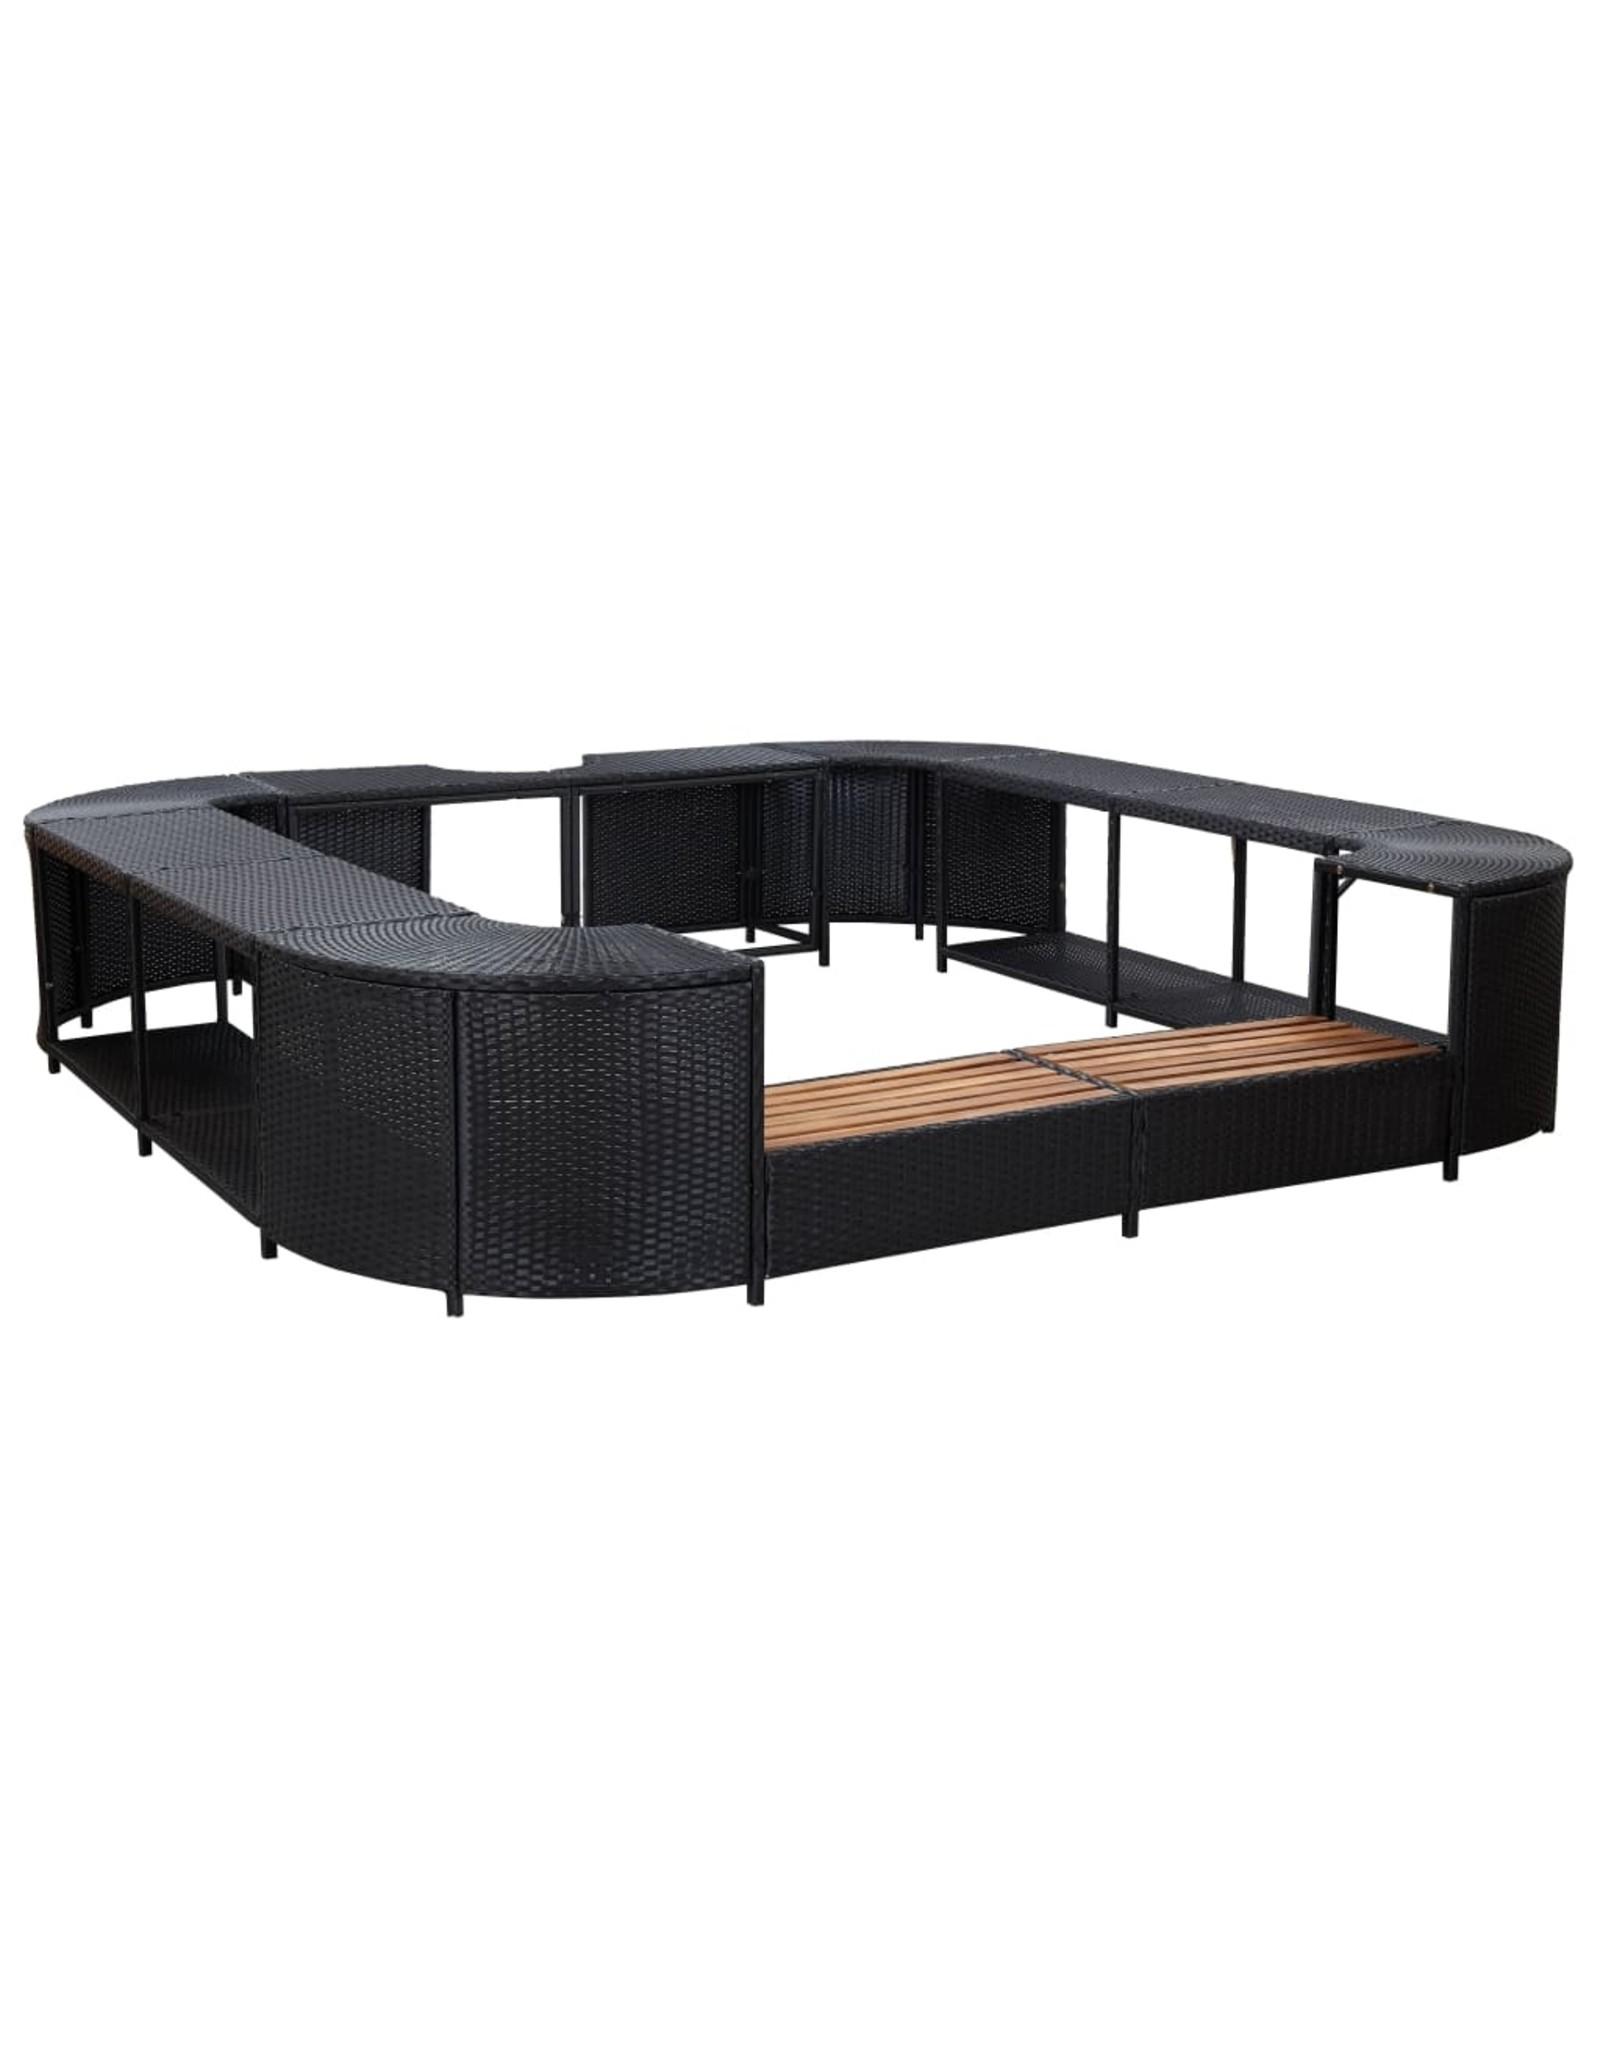 Spa-ombouw vierkant 268x268x55 cm poly rattan zwart